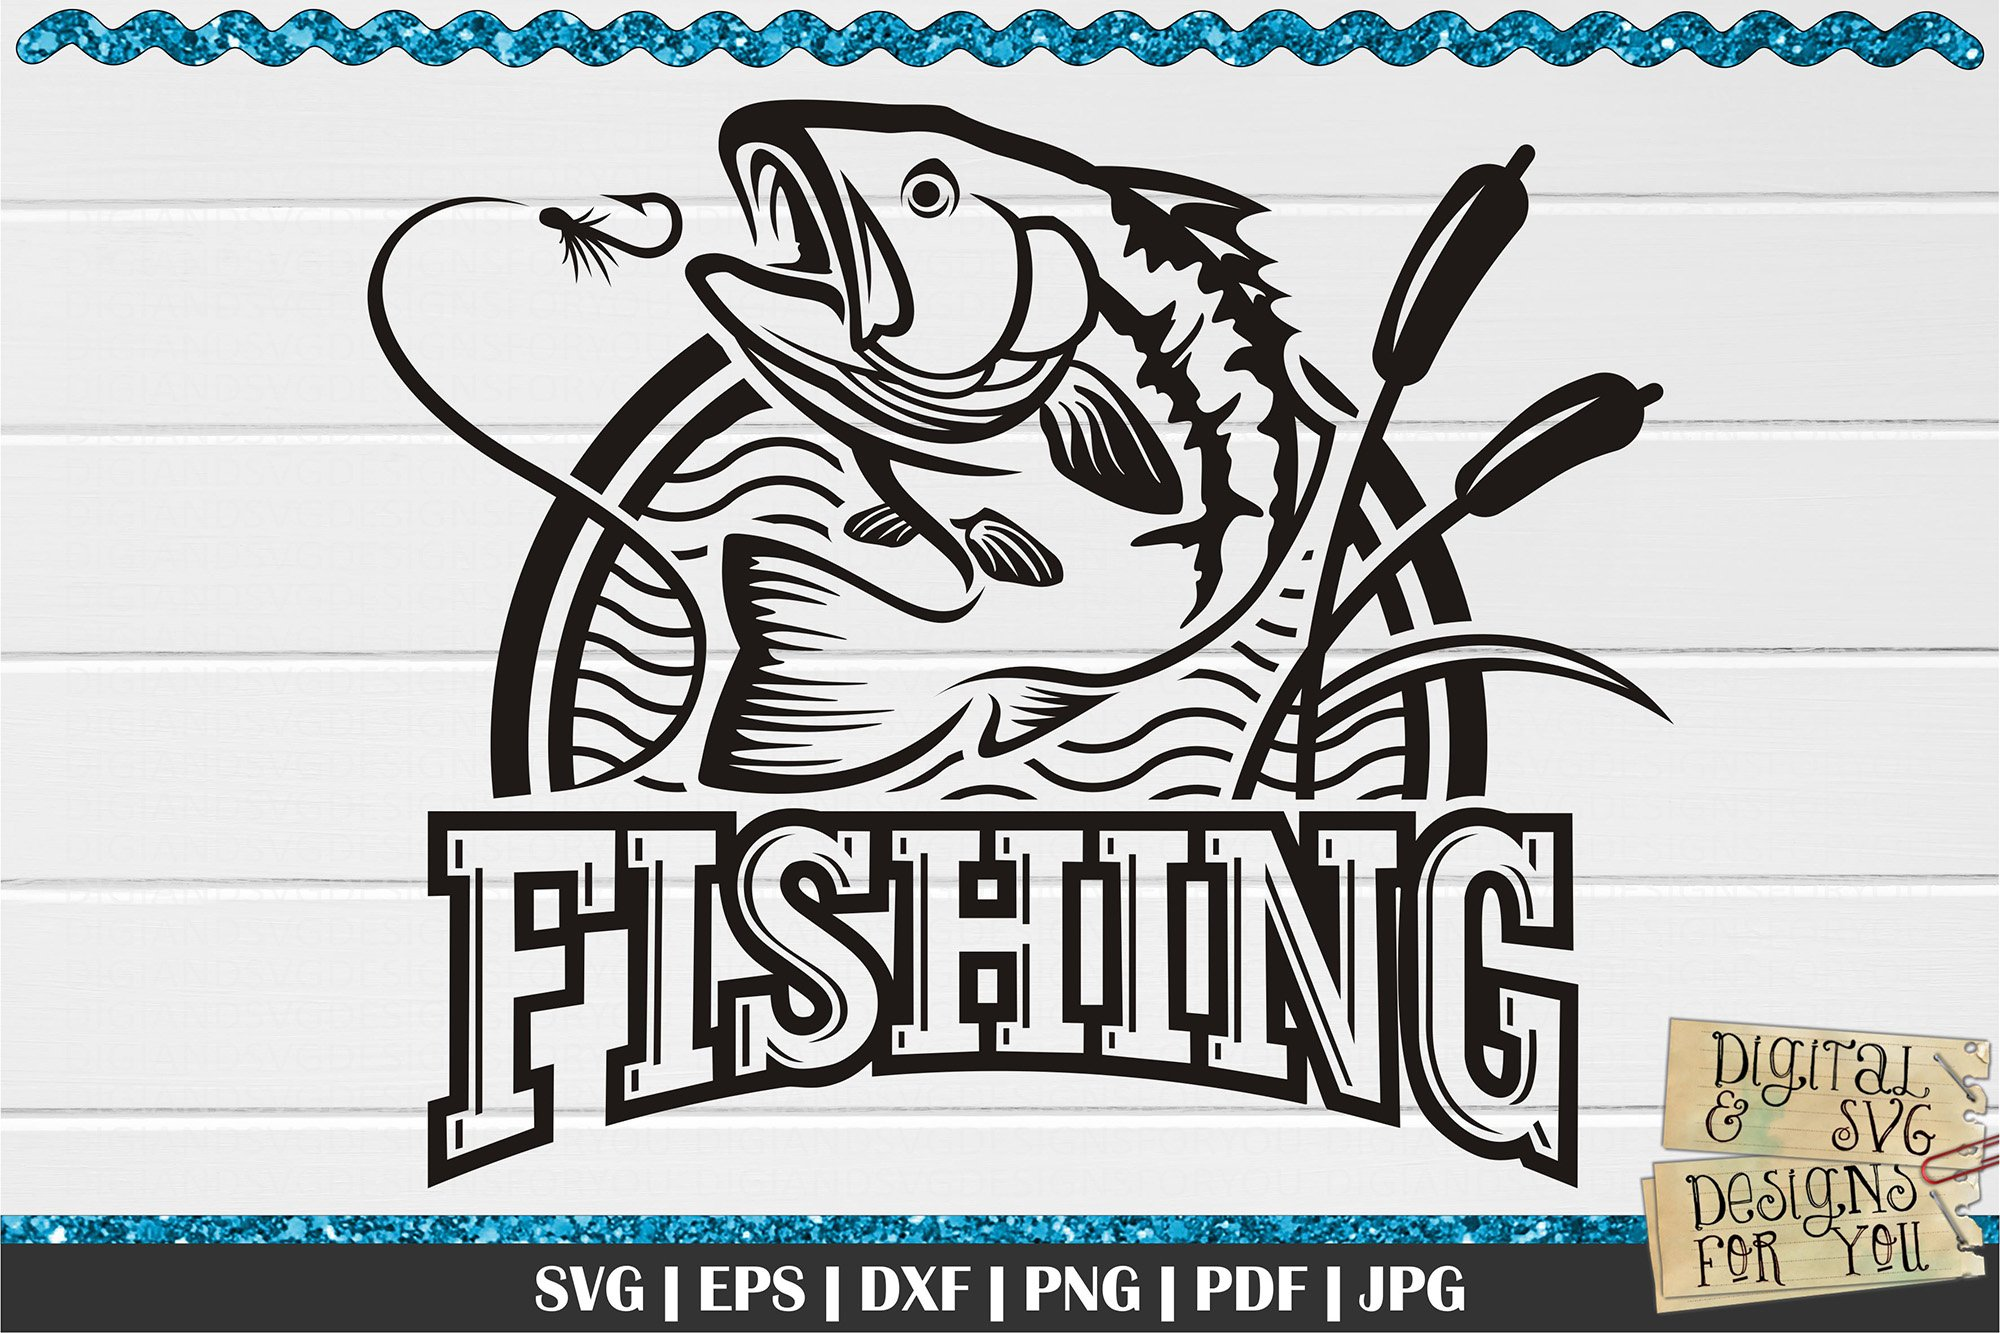 Download Fishing Logo Svg Bass Svg Fishing 772512 Cut Files